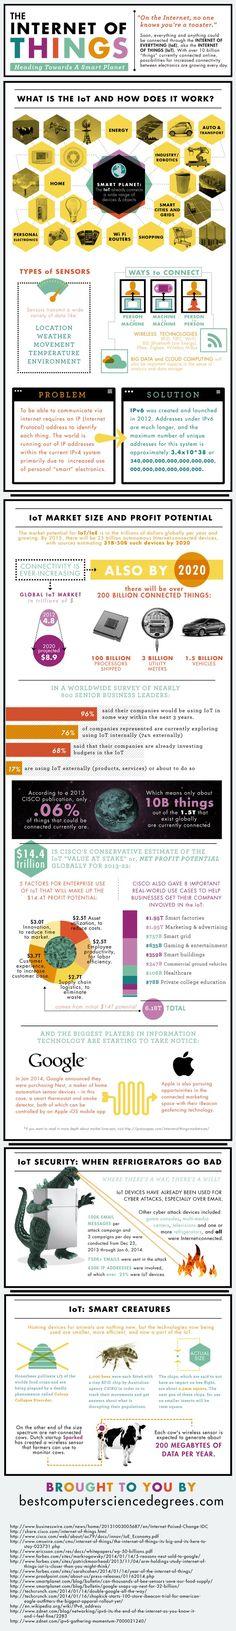 Internet of Things #IoT